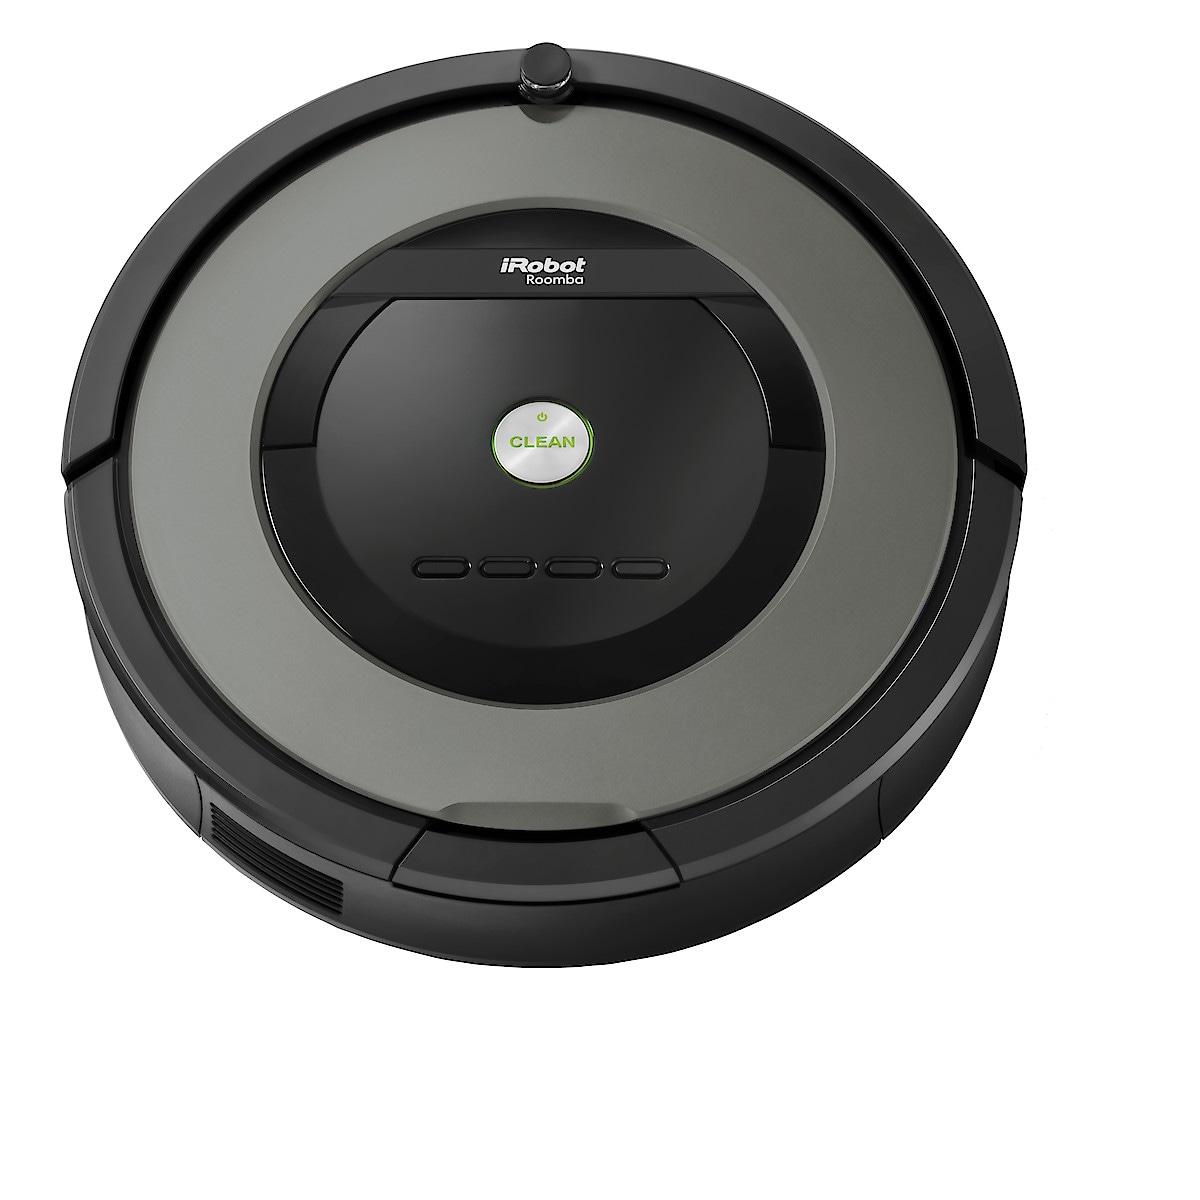 iRobot Roomba 865, robotstøvsuger